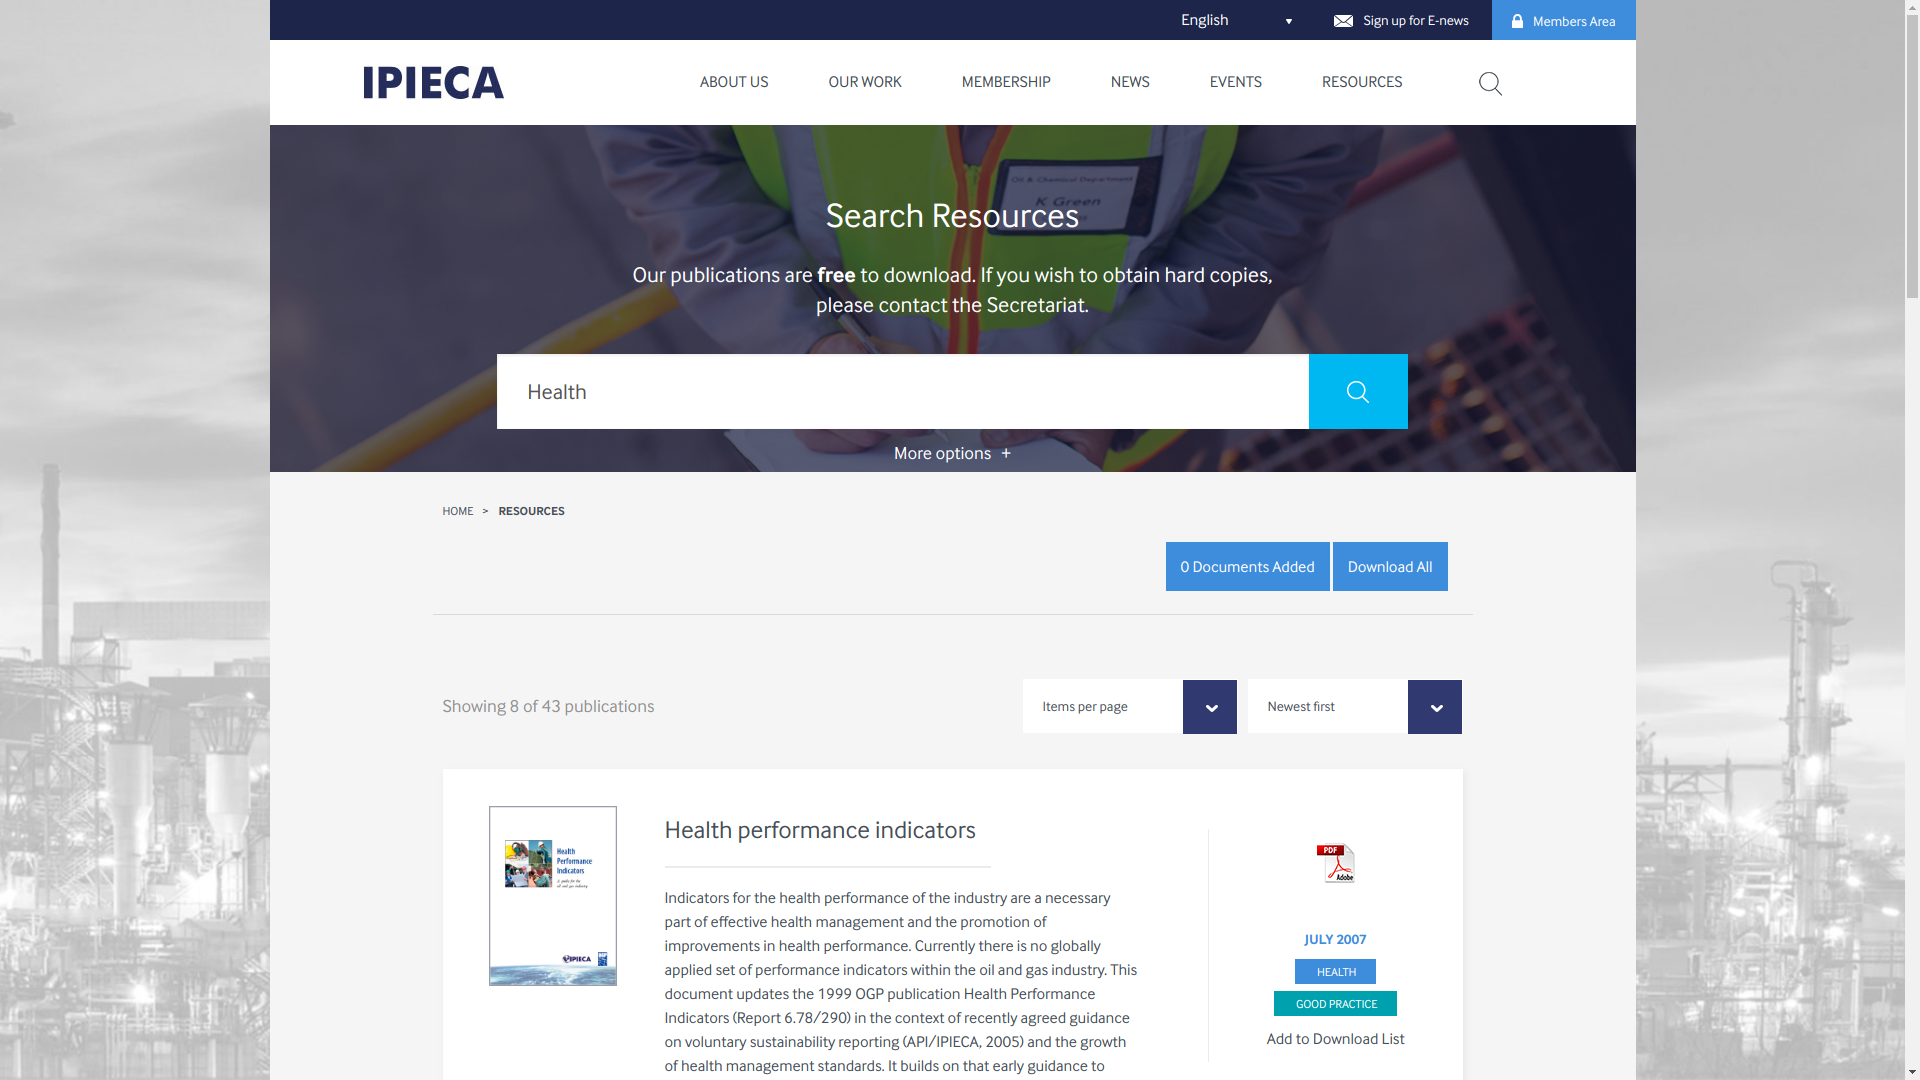 IPIECA (Global Oil & Gas Industry) Health Committee